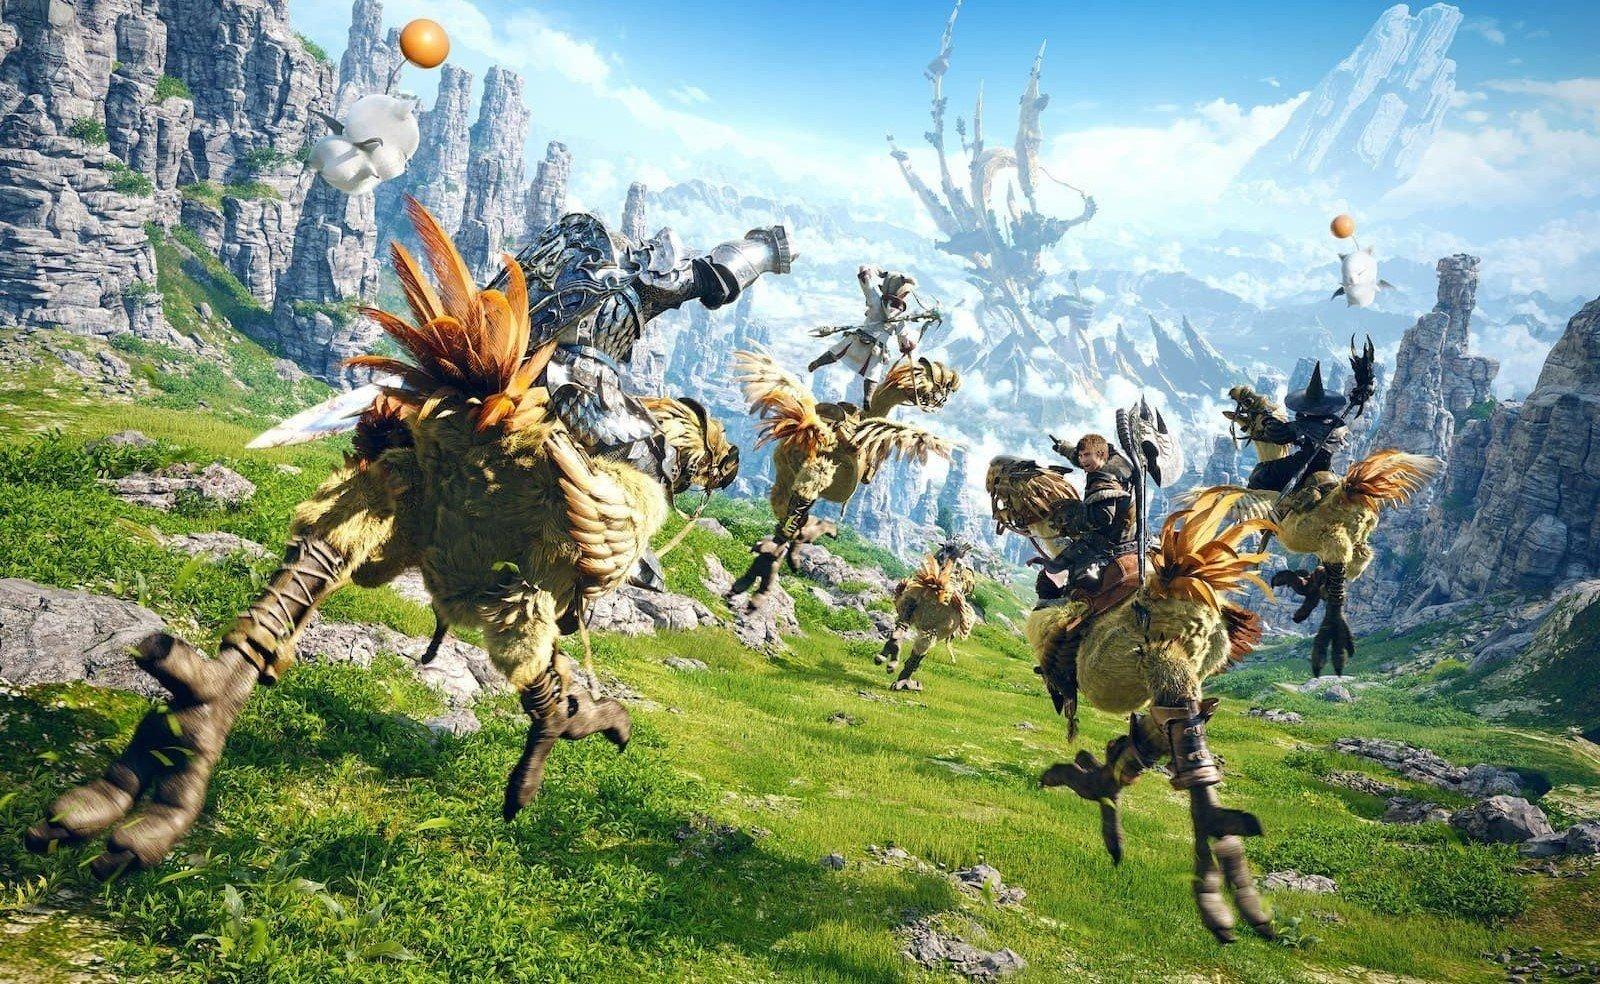 Final Fantasy XIV Confirmed for PS5 Backward Compatibility